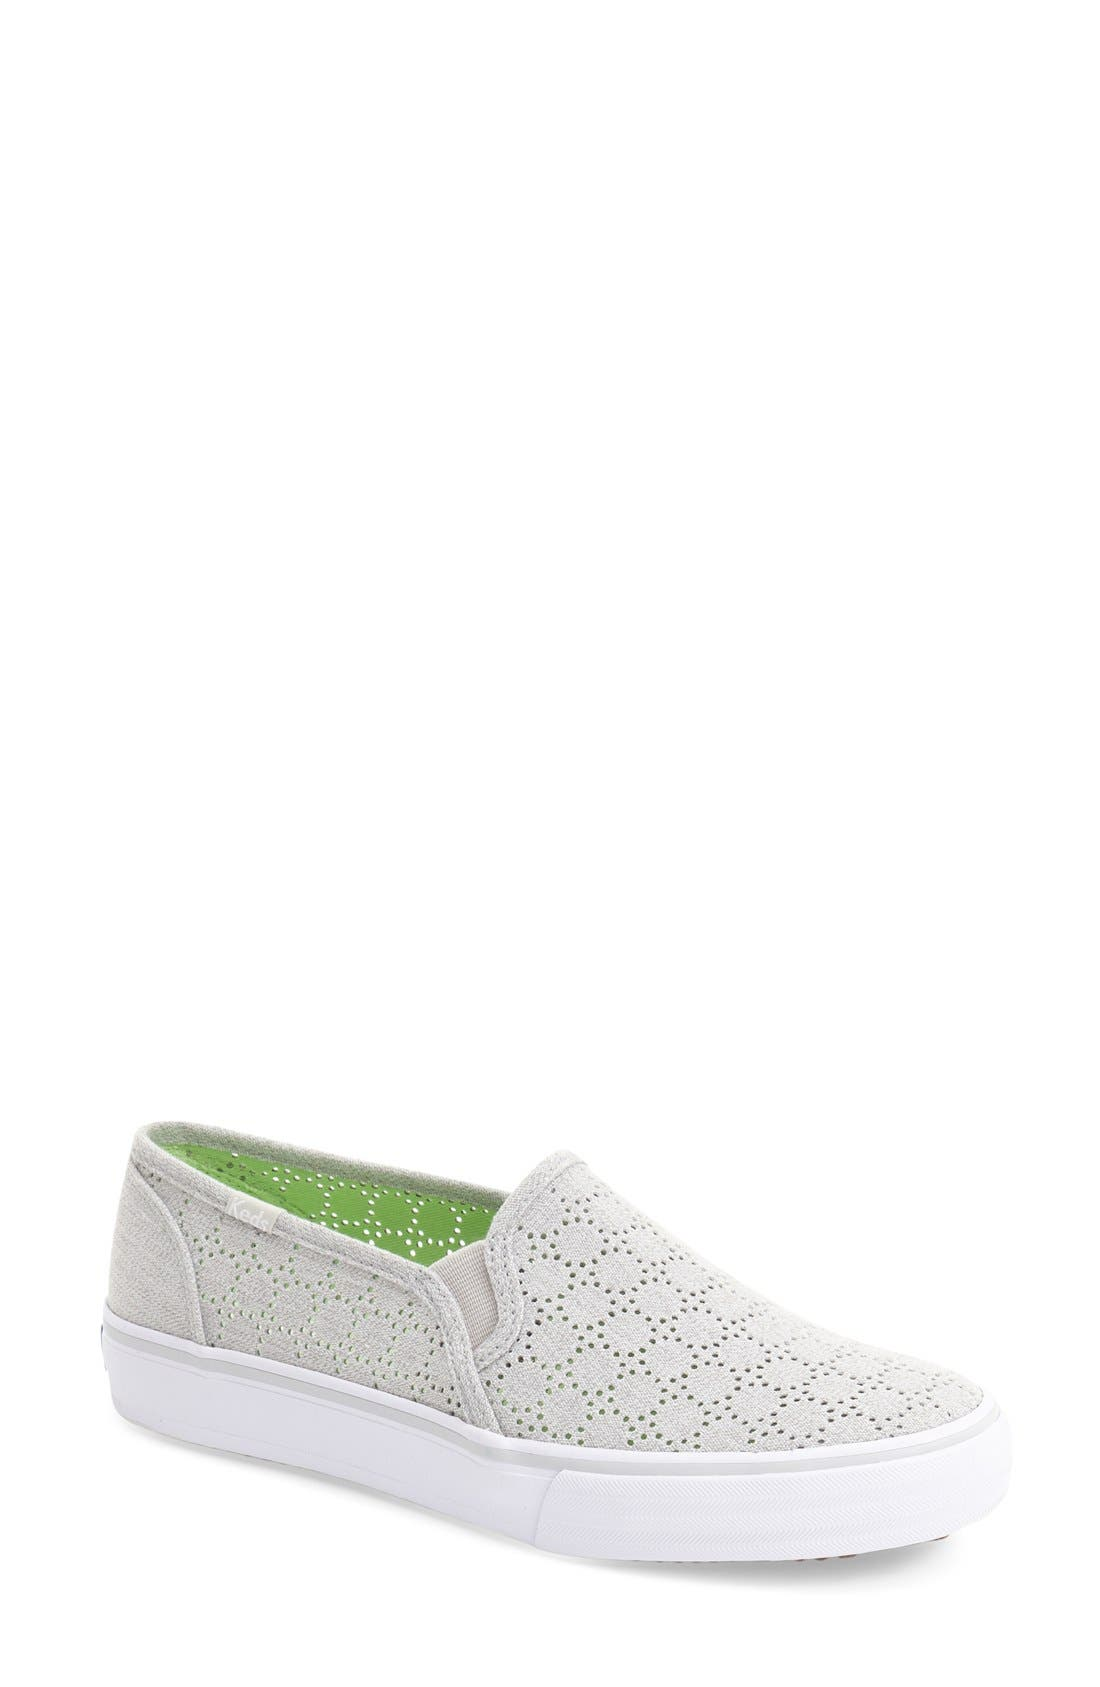 Alternate Image 1 Selected - Keds® 'Double Decker' Perforated Slip-On Sneaker (Women)